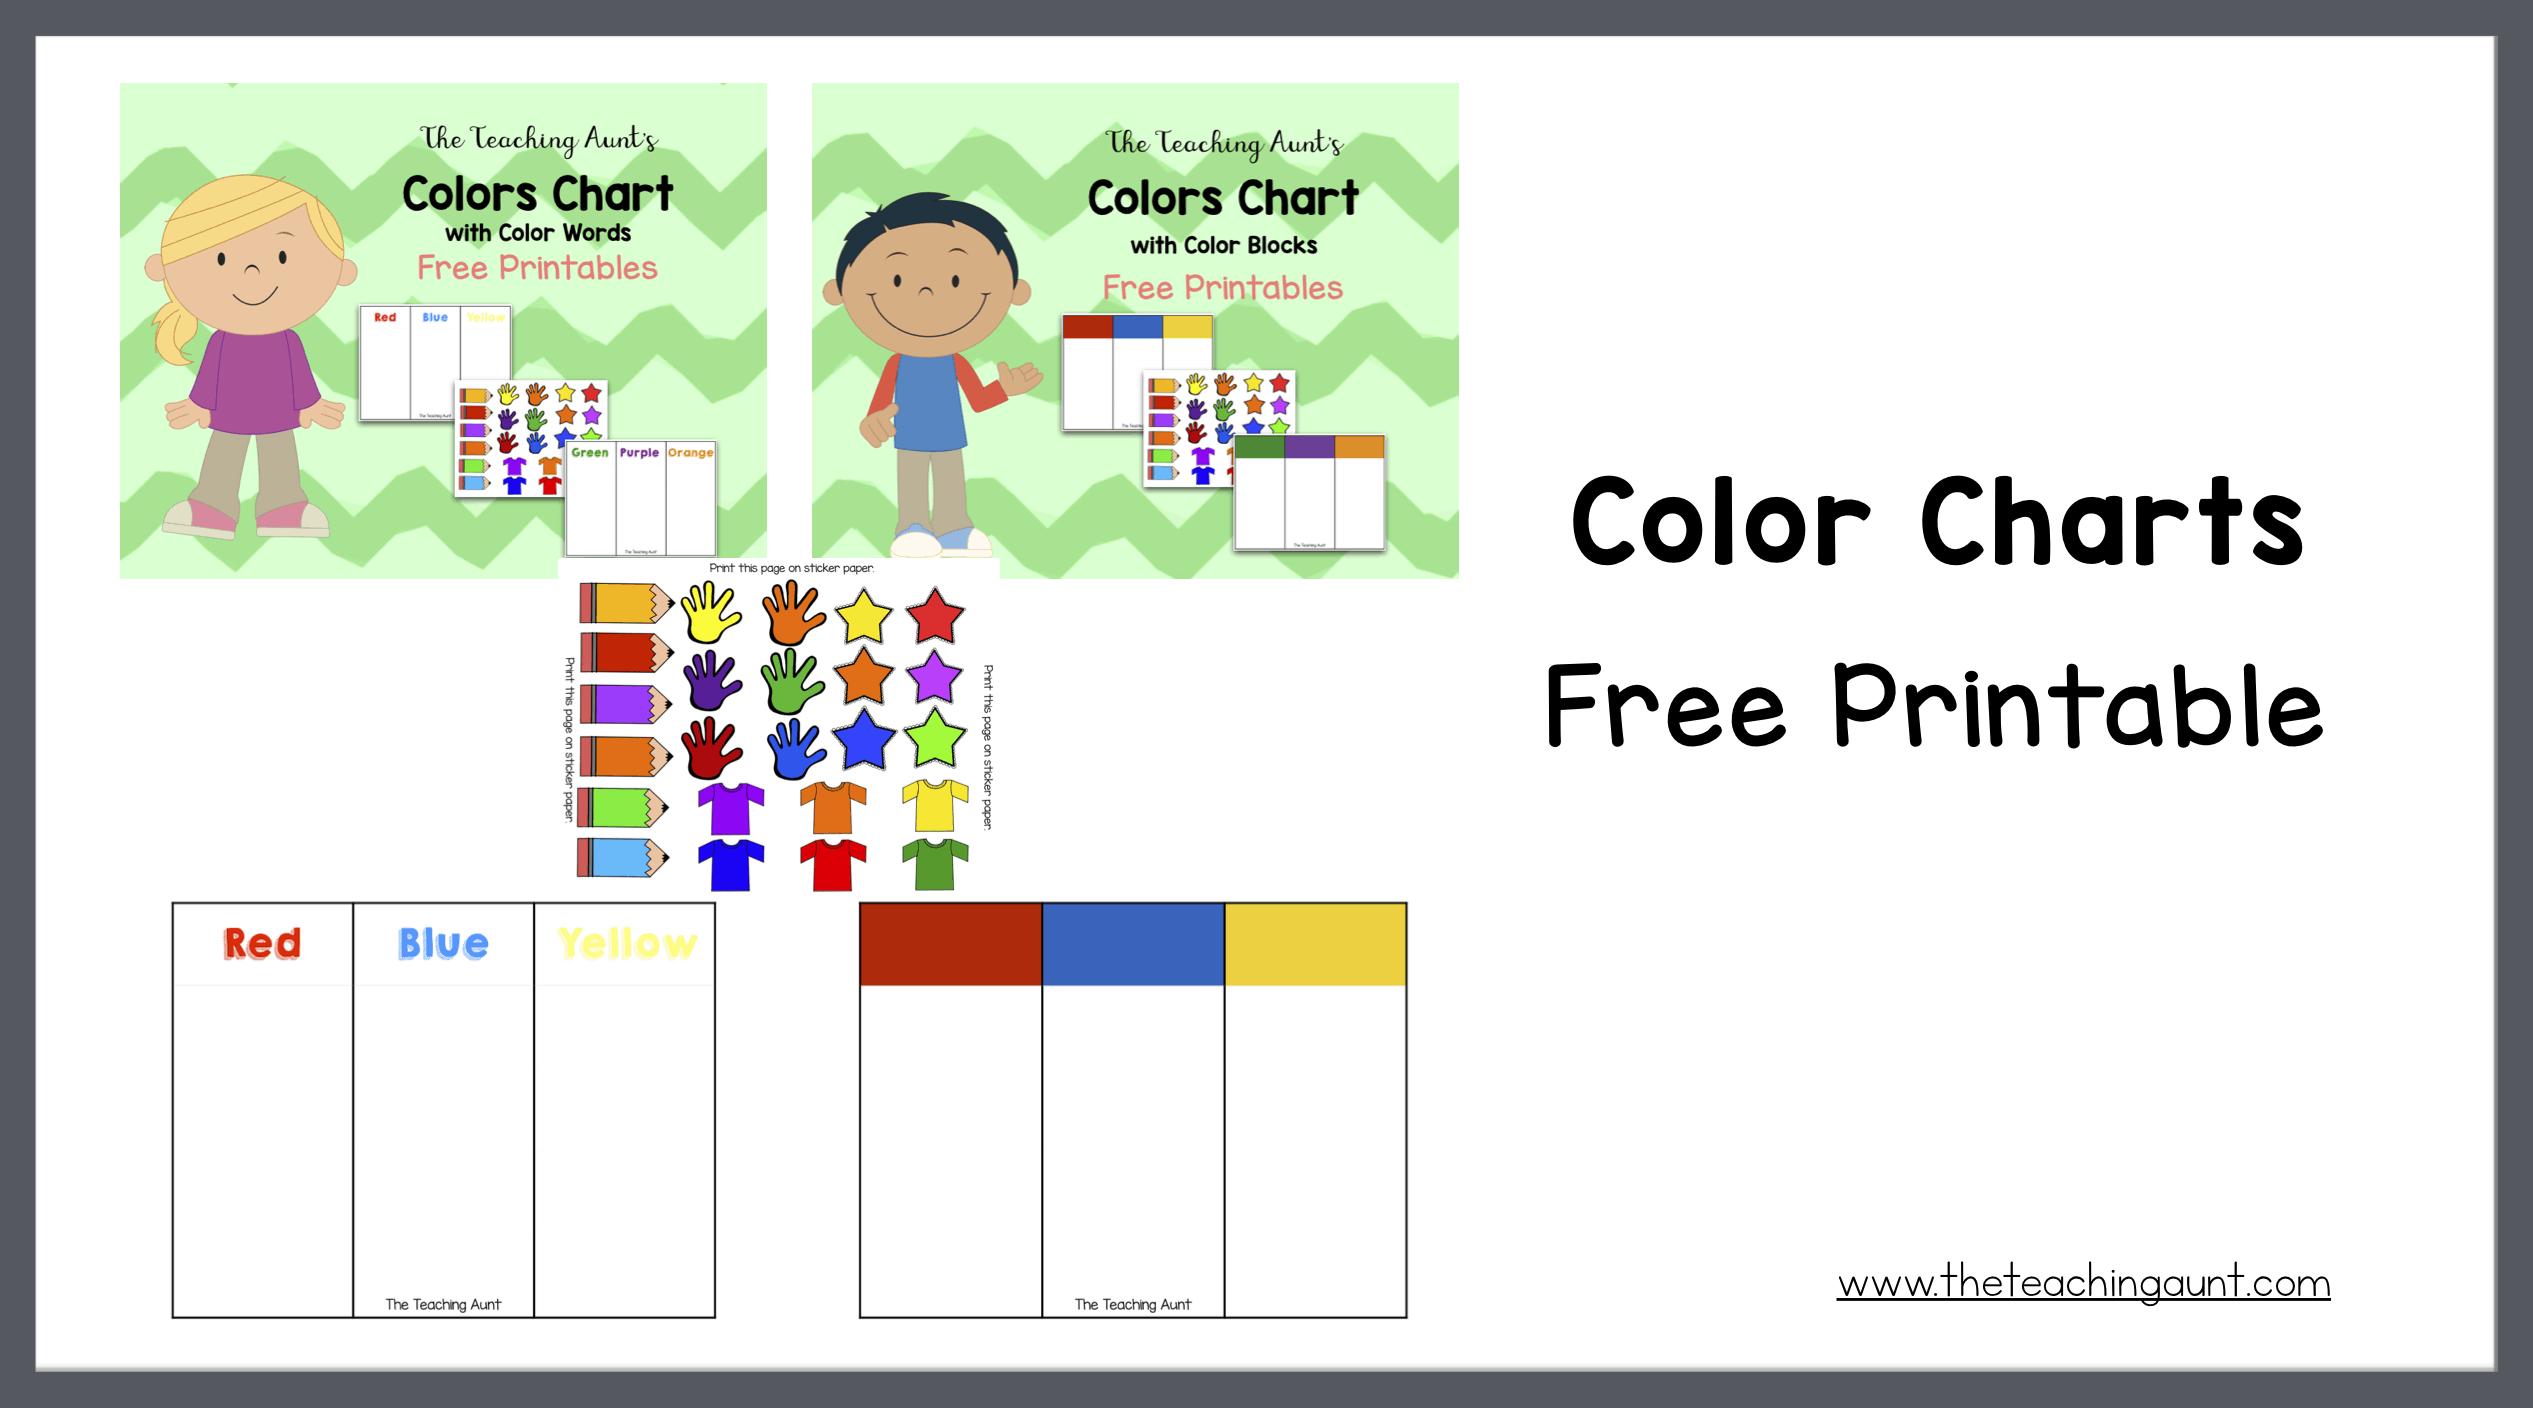 Color Charts Free Printables